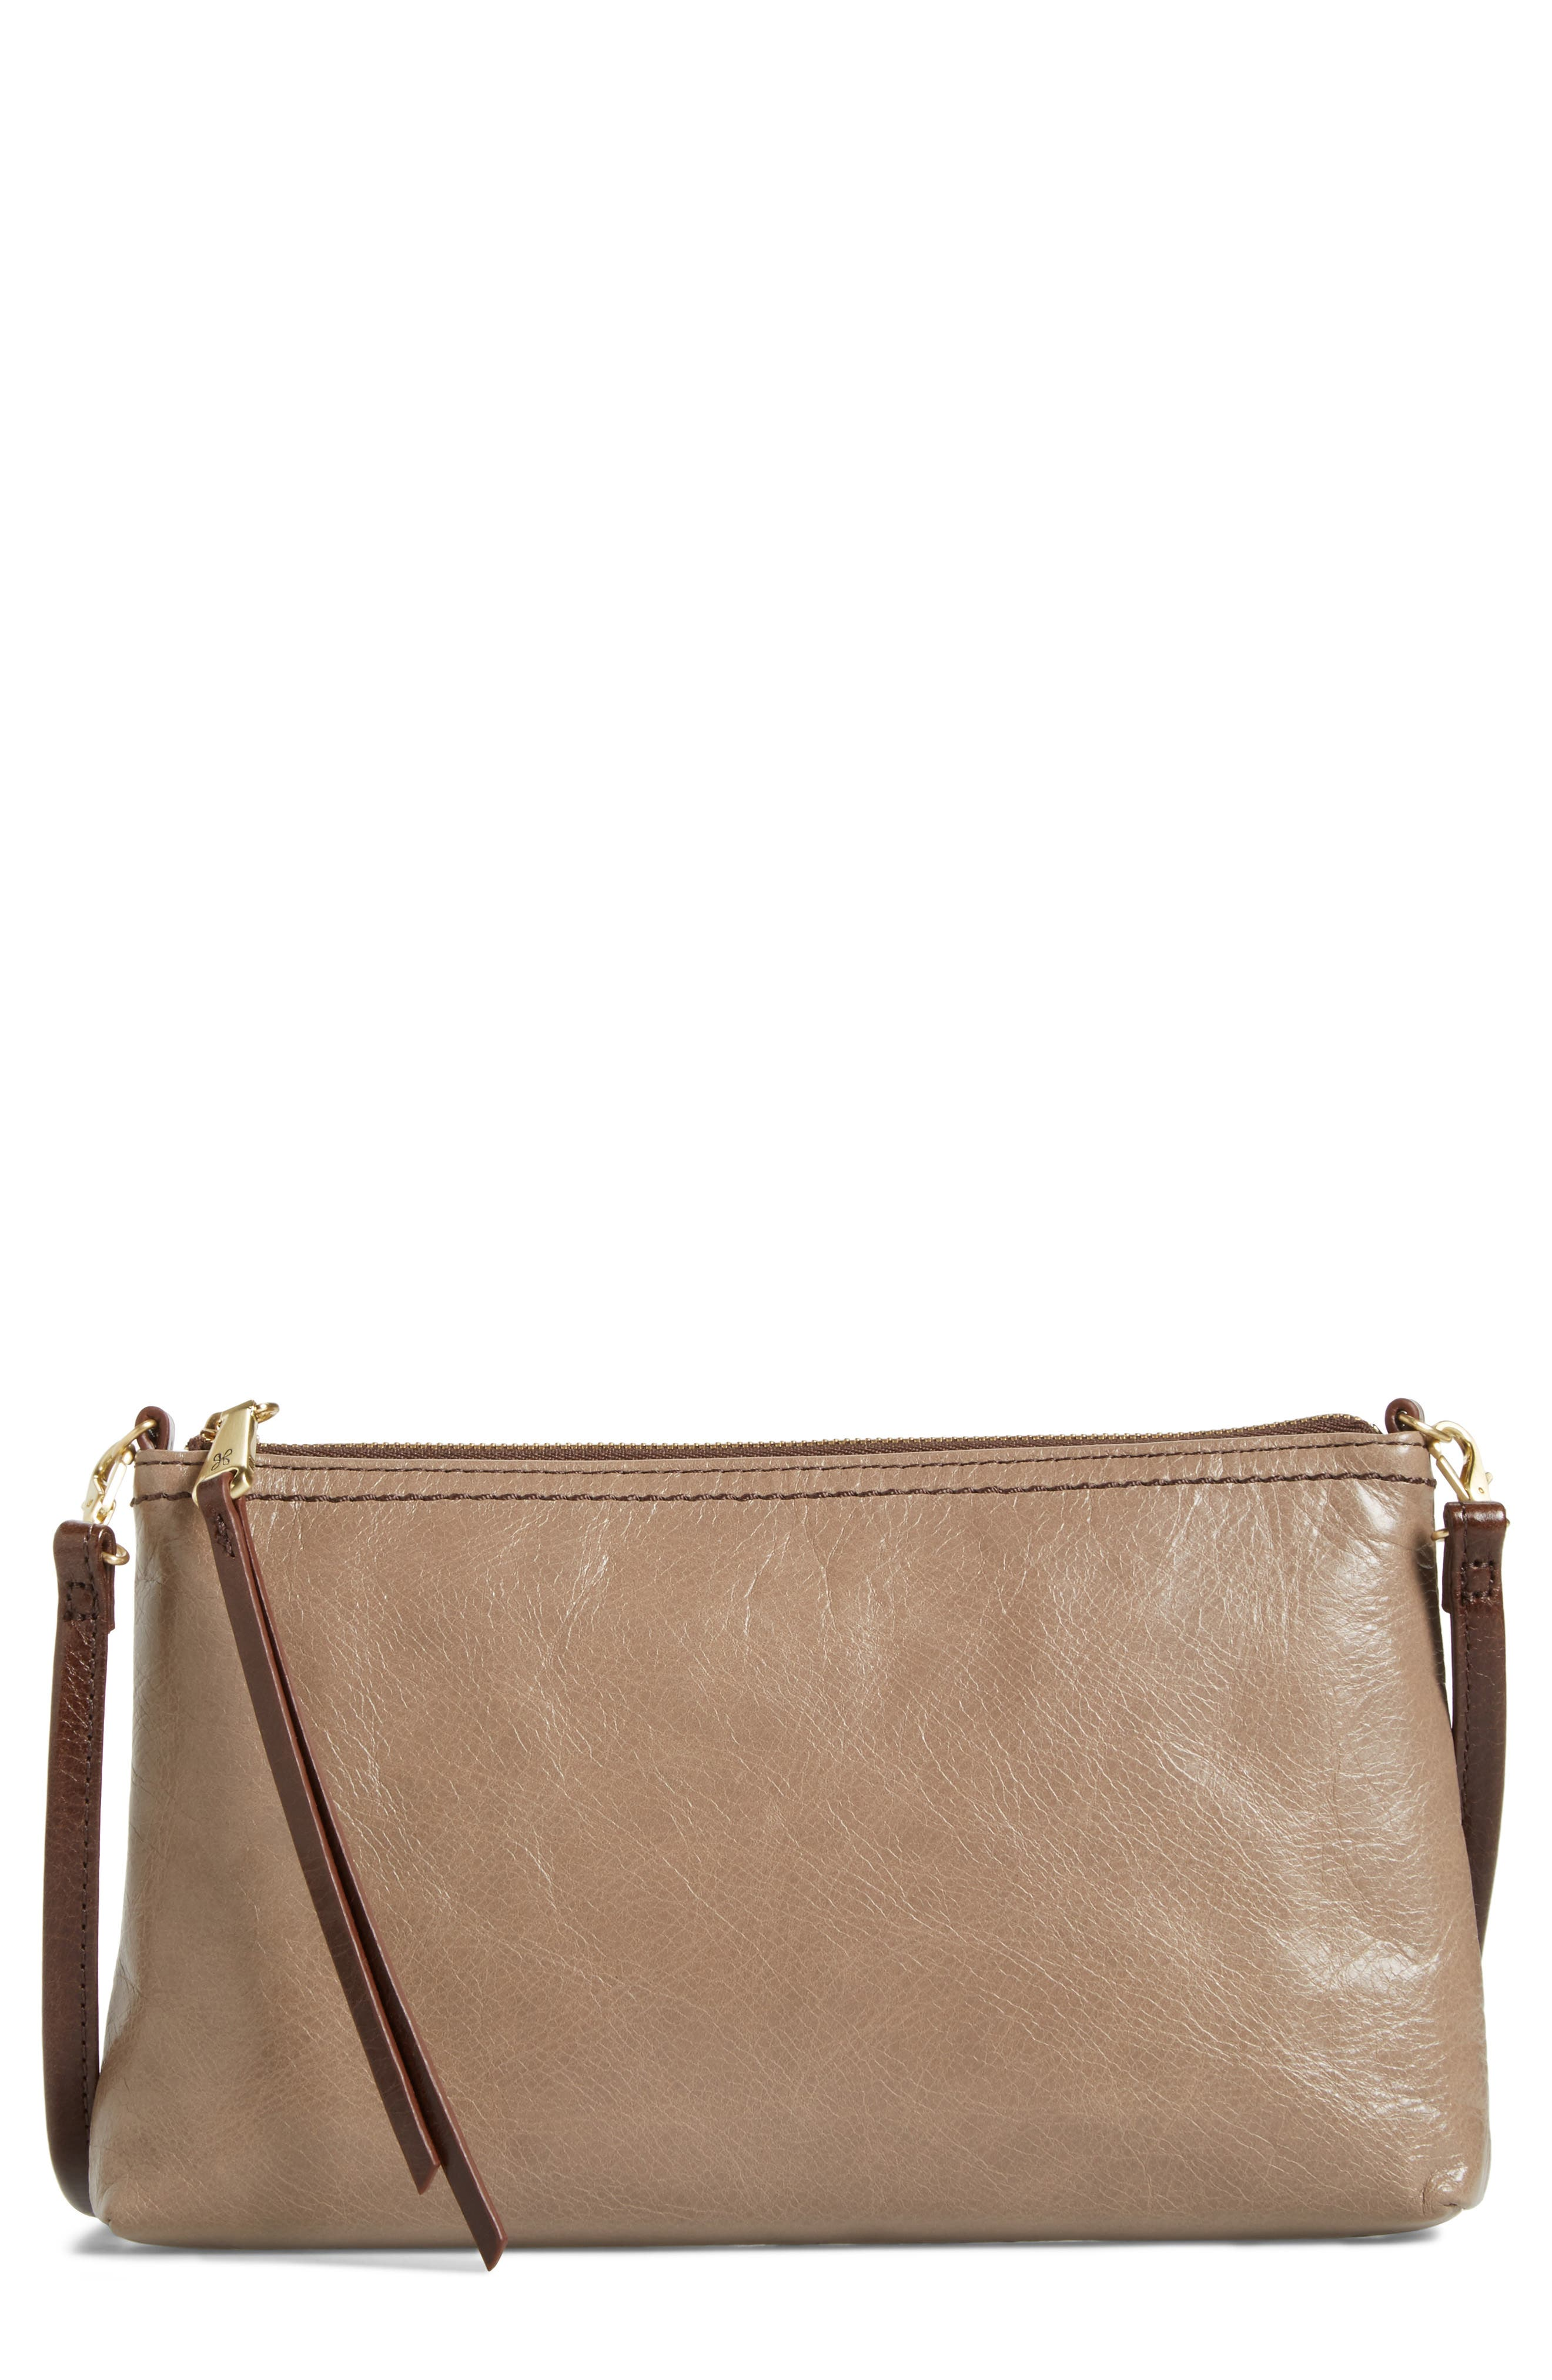 Hobo 'Darcy' Leather Crossbody Bag